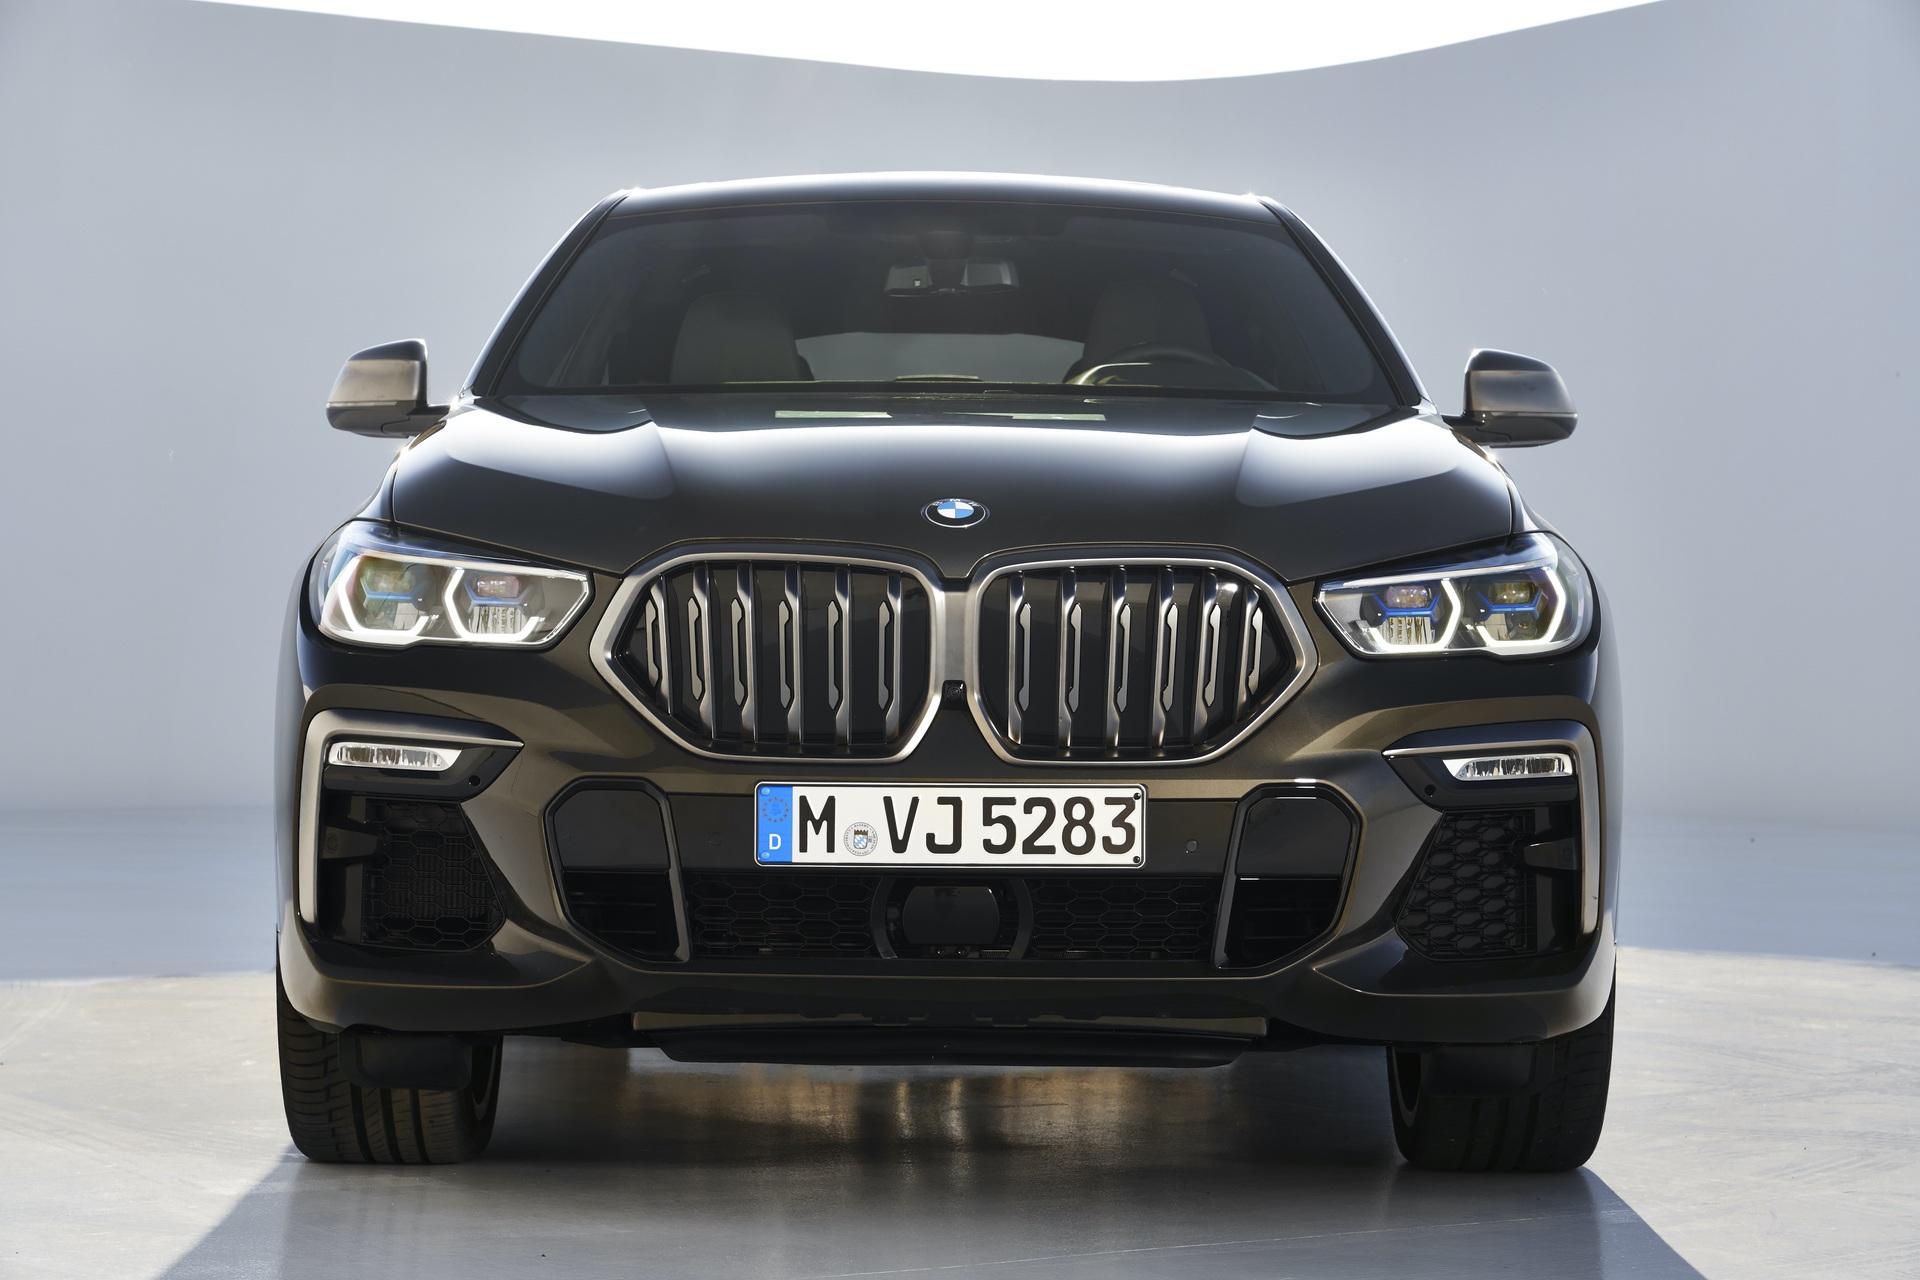 2020 BMW X6 exterior design 16